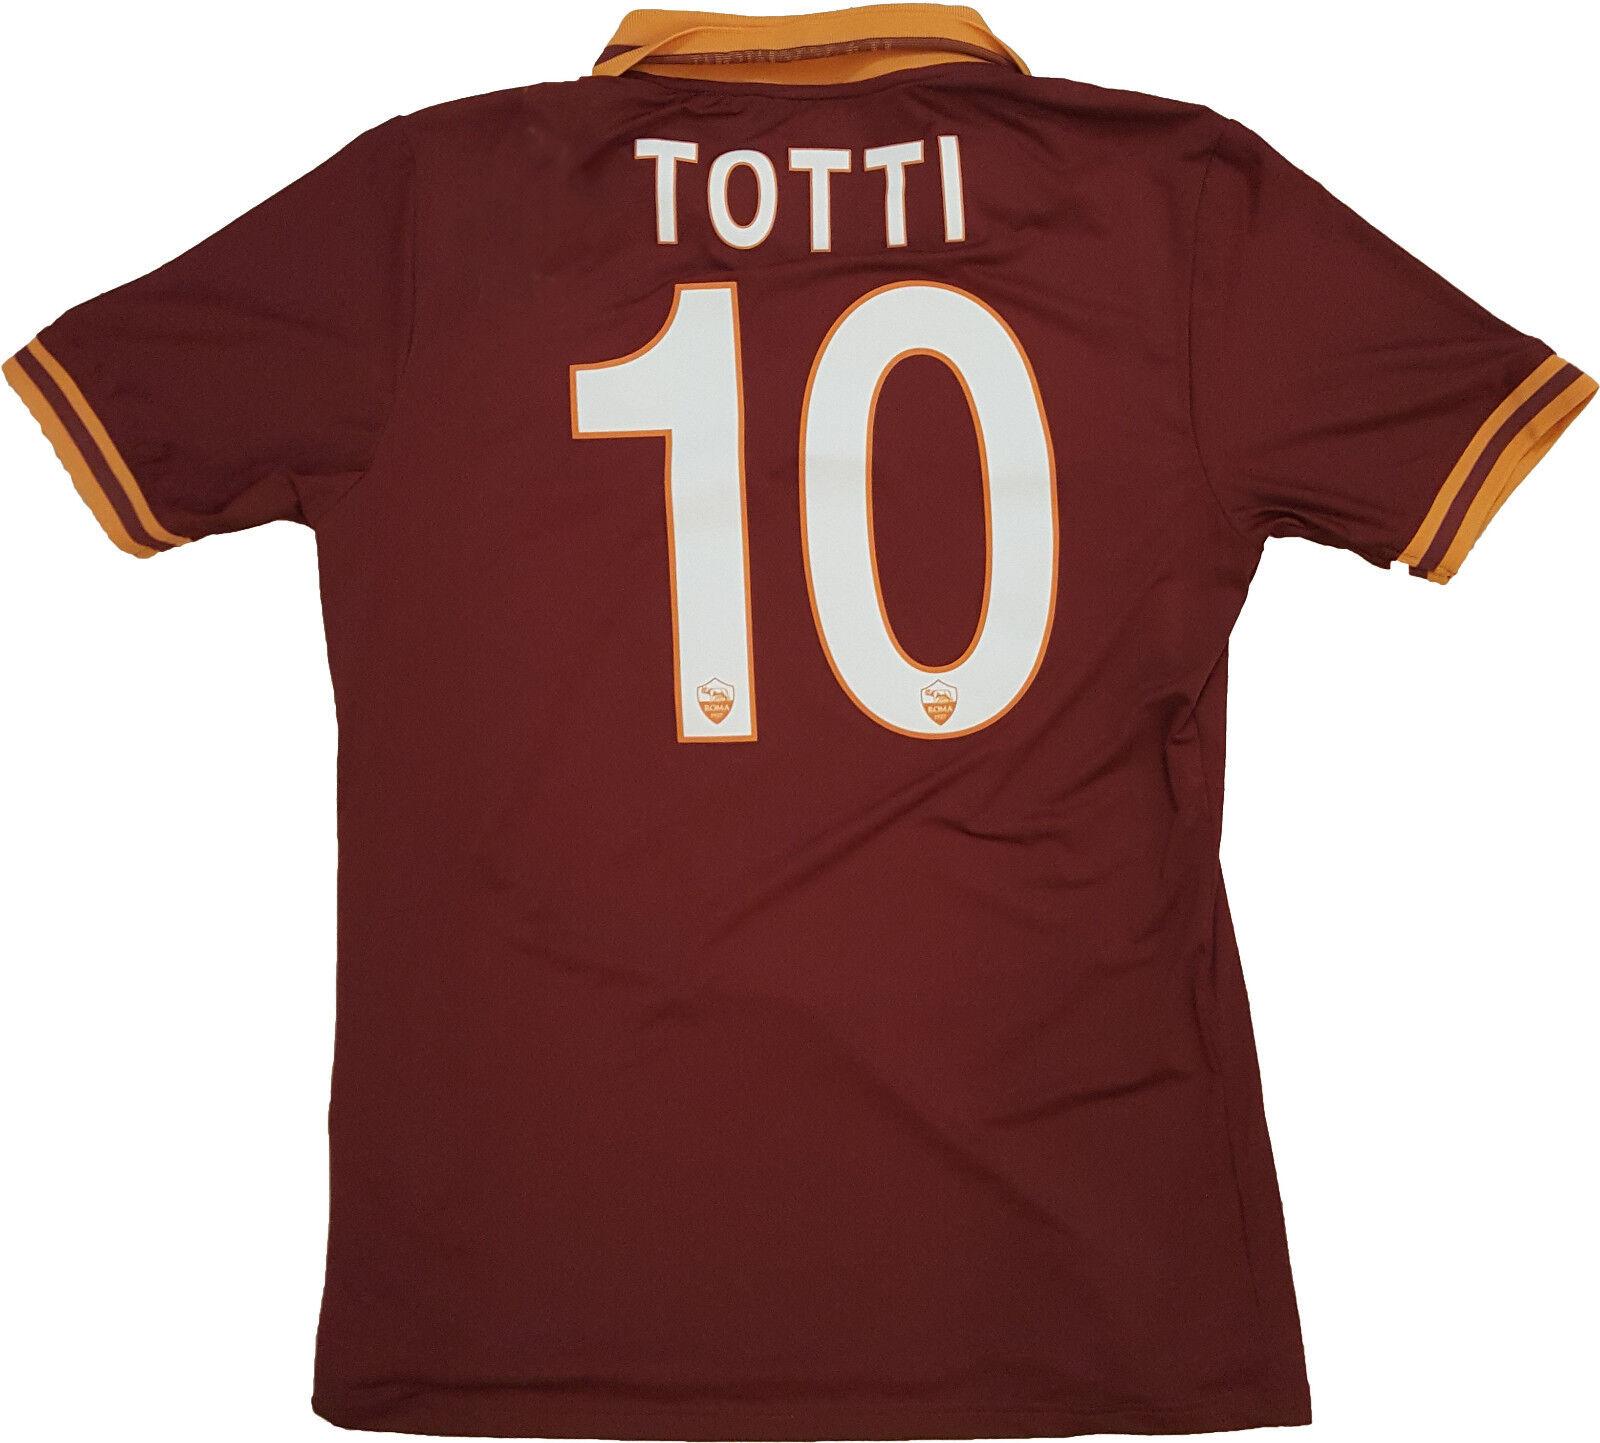 MAGLIA ROMA TOTTI issued Serie A A A JERSEY SHIRT 2013 2014 ROMA CARES rara M 7b0f5b